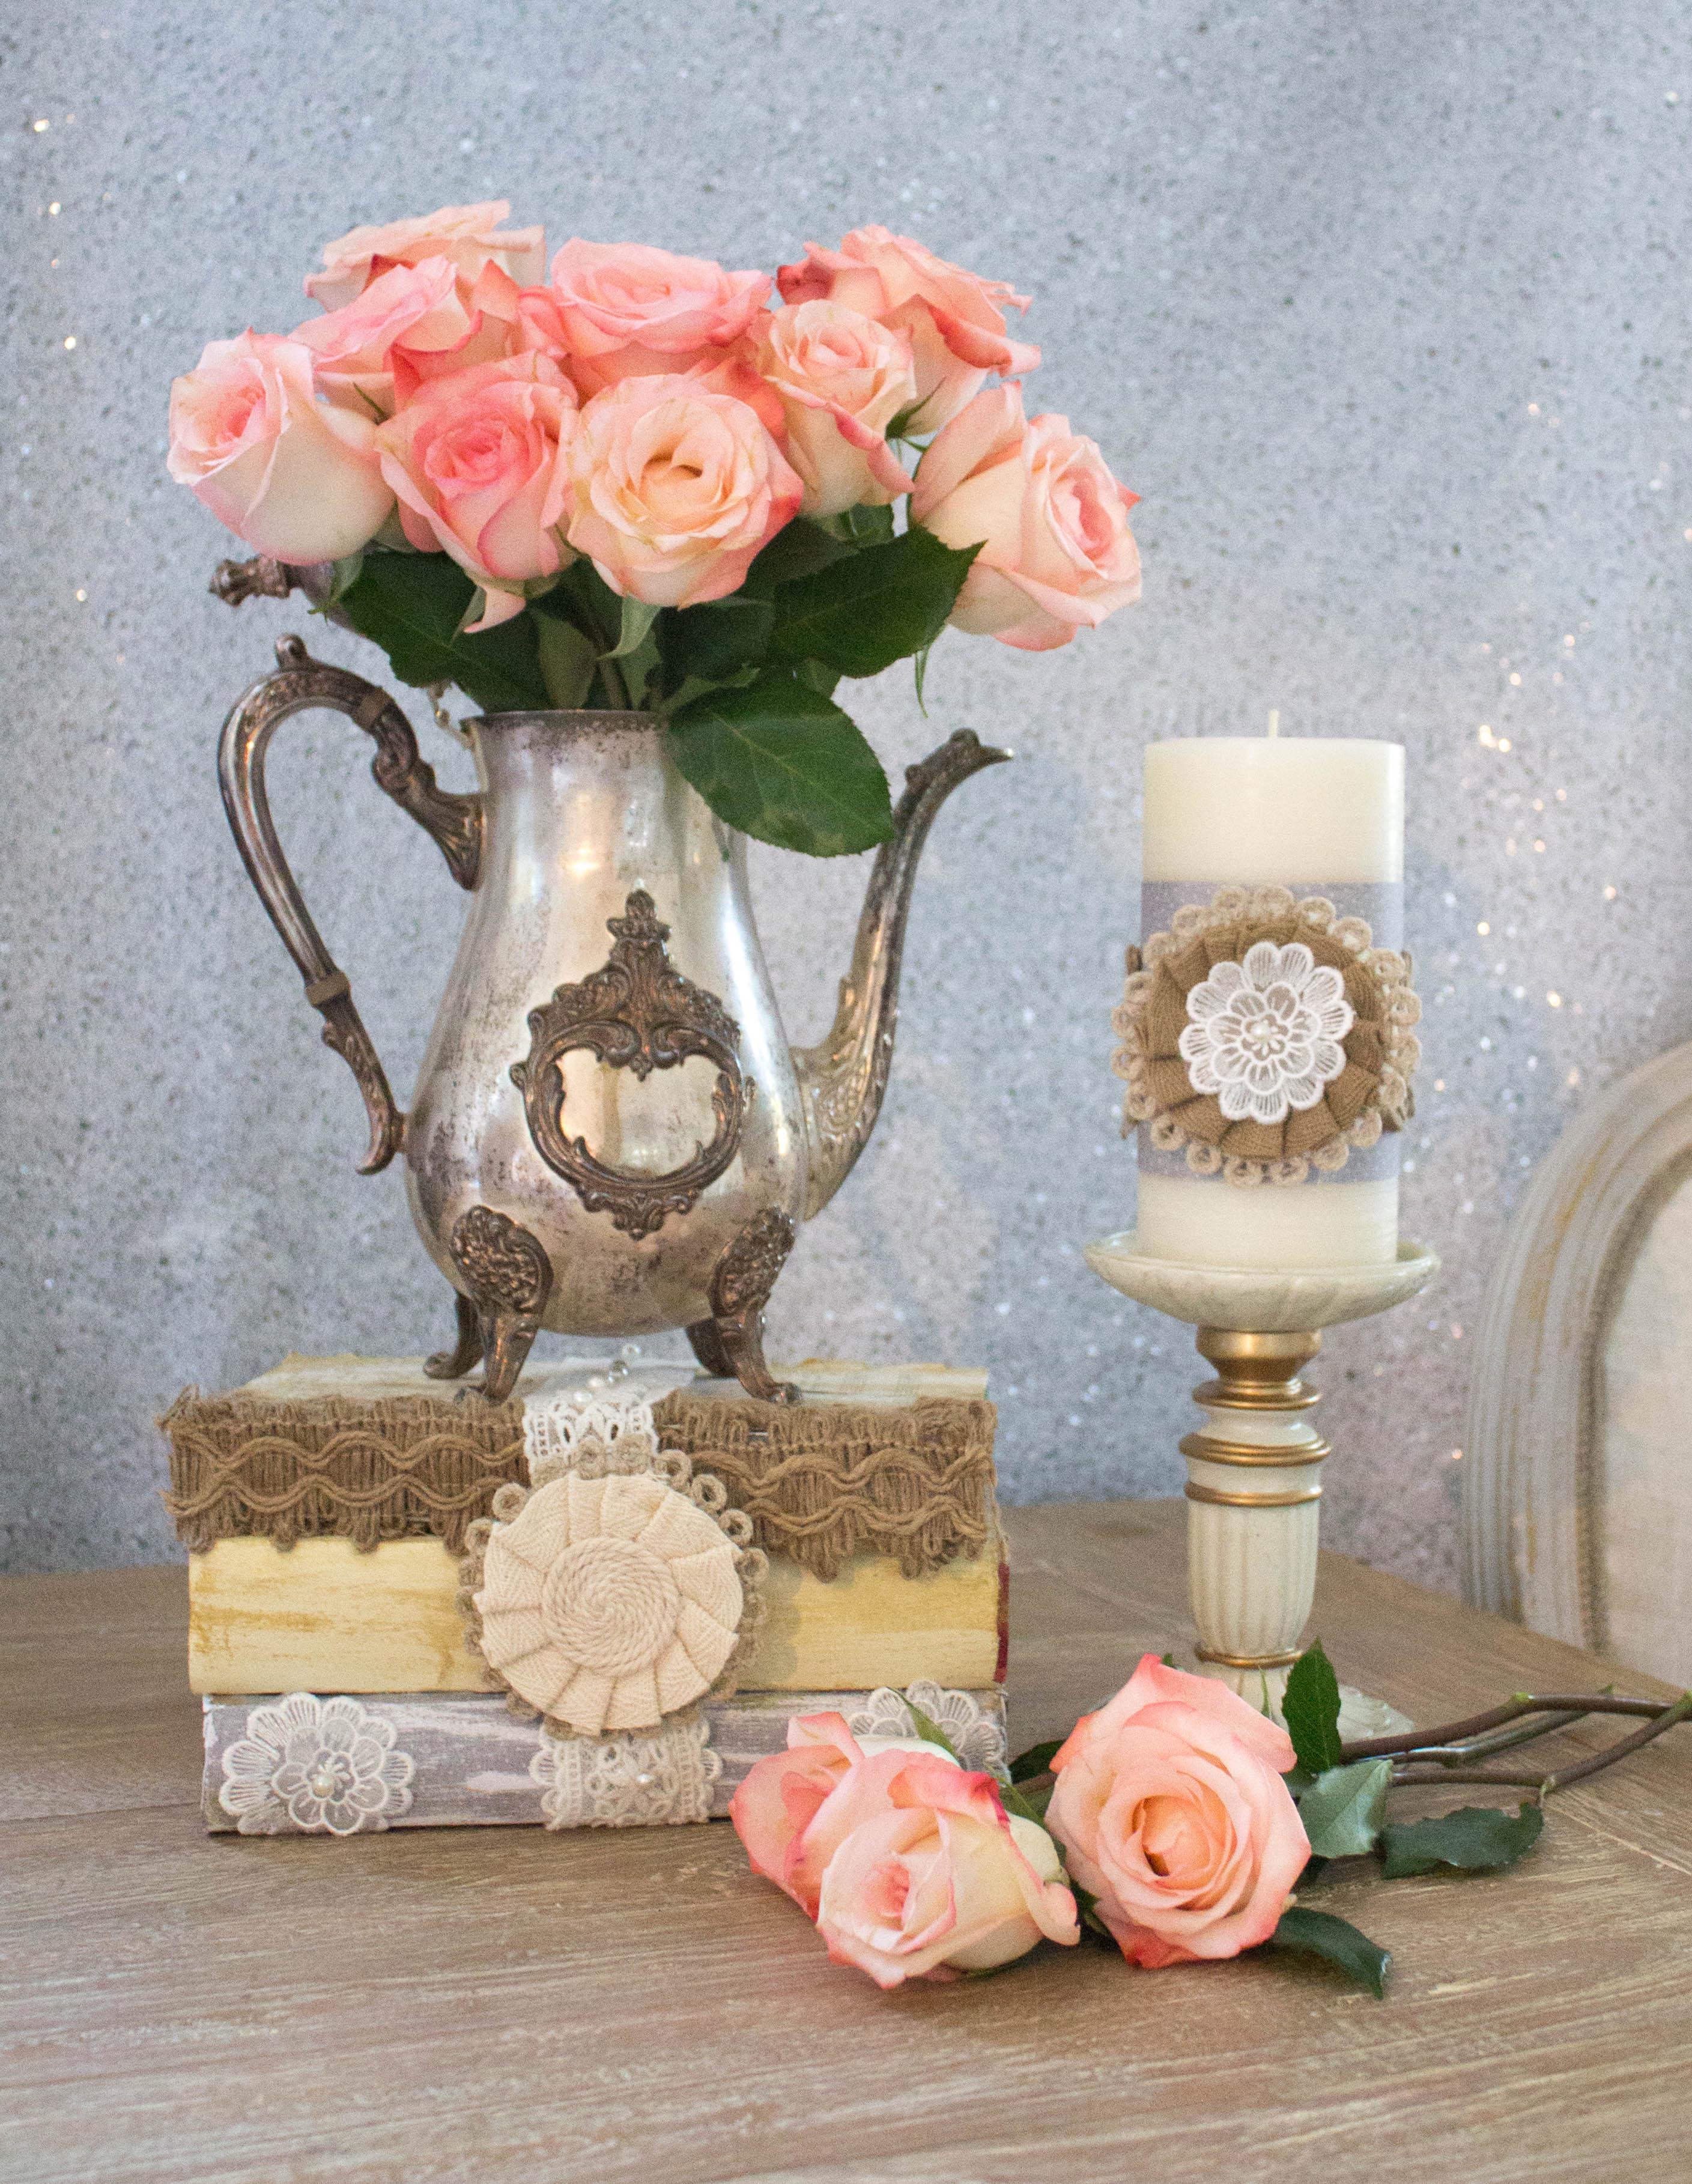 burlap-and-lace-wedding-decor-vintage-shabby-rusti-5